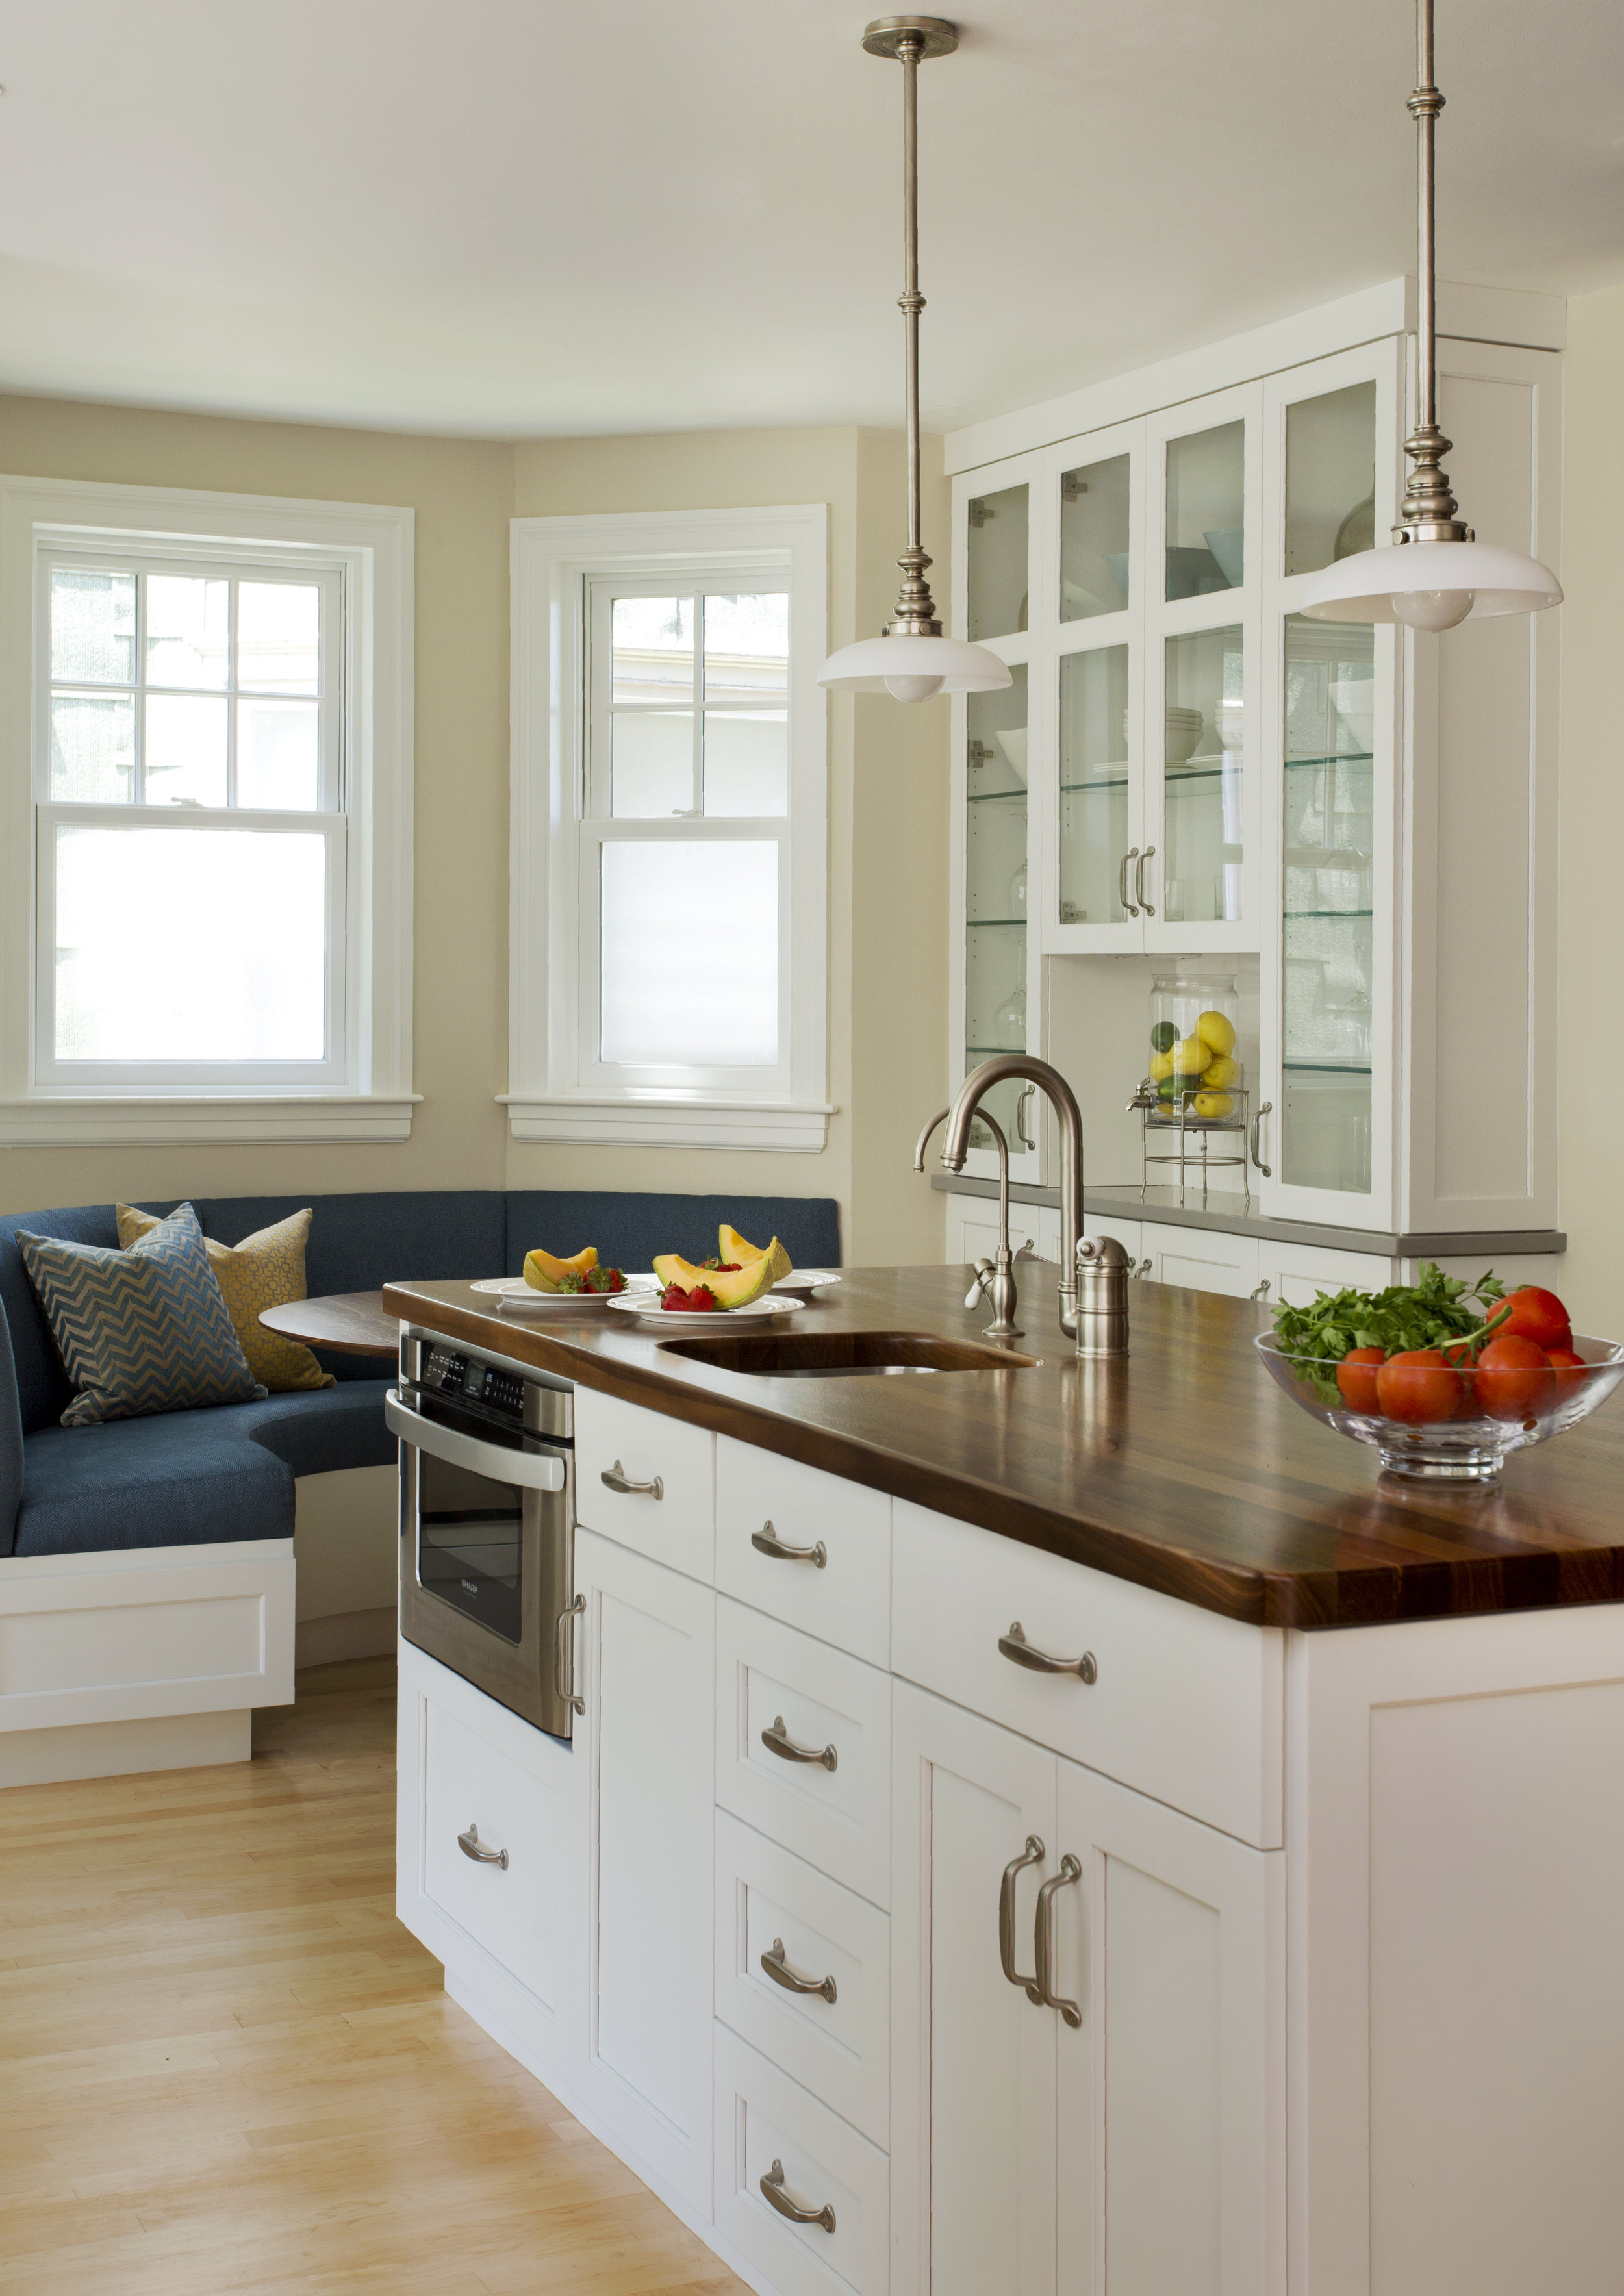 Jeff Swanson 6 14 kitchen 3 - Copy.jpg